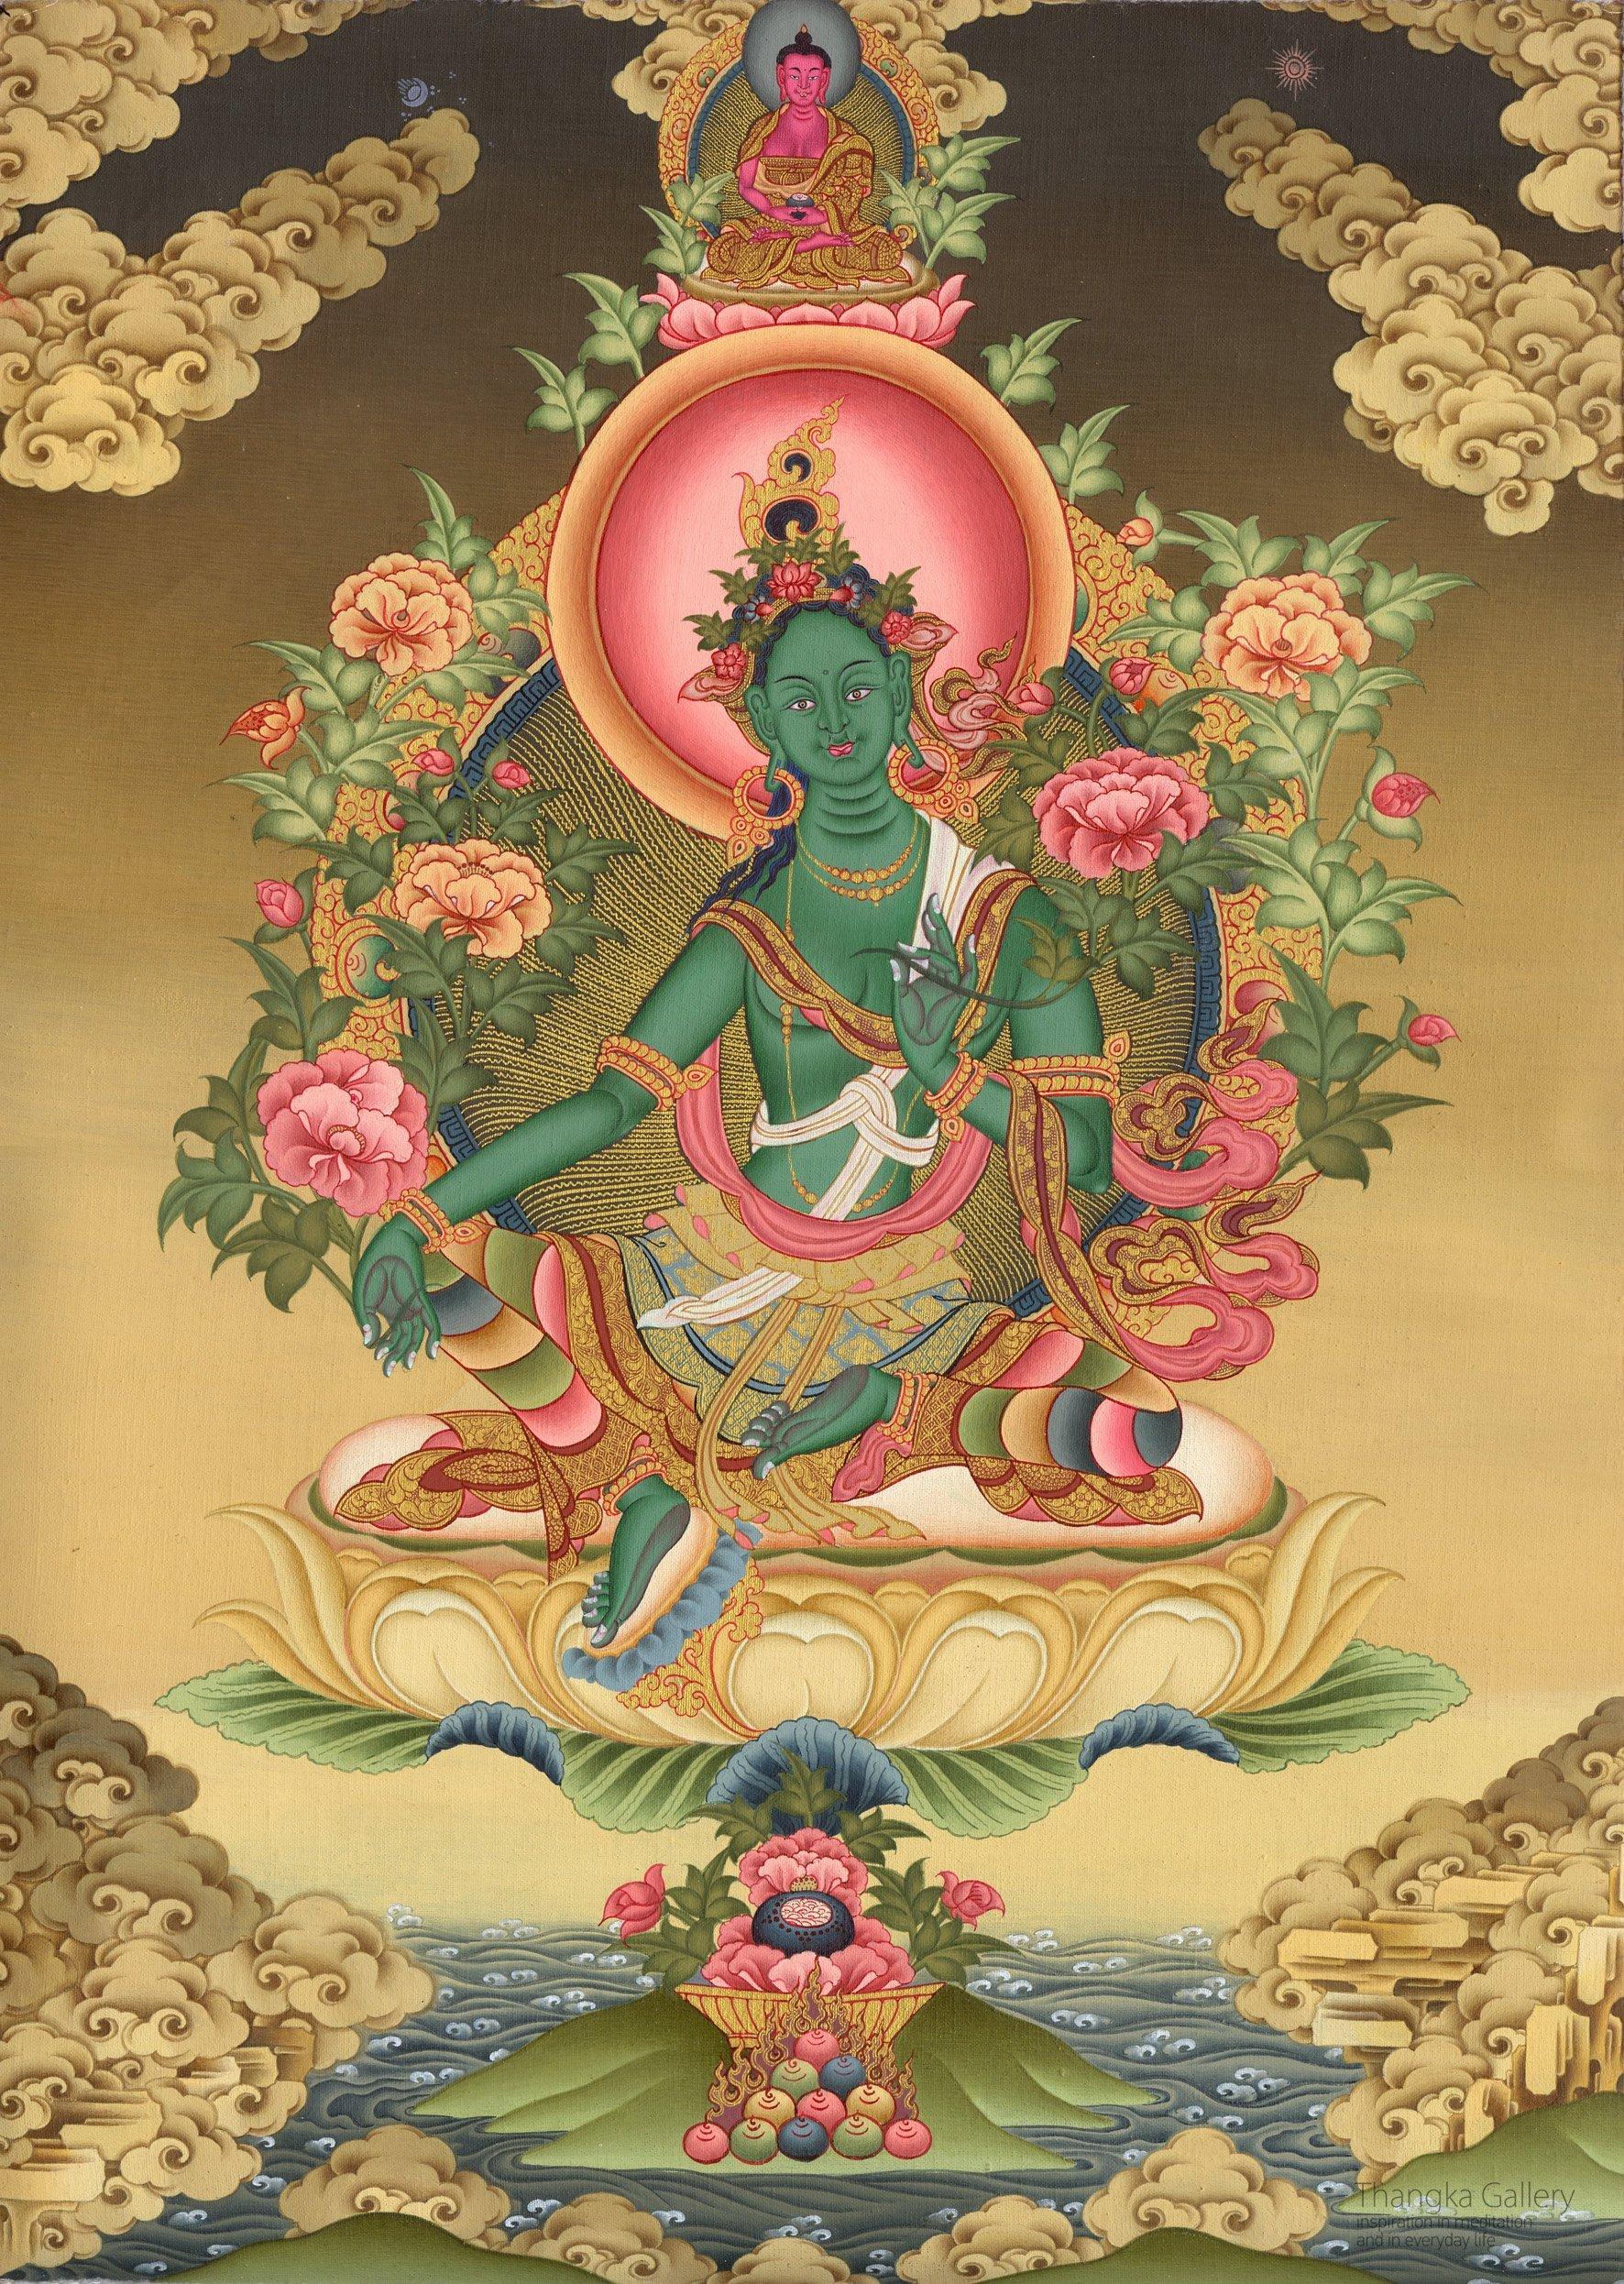 Green Tara with Amitabha her guru